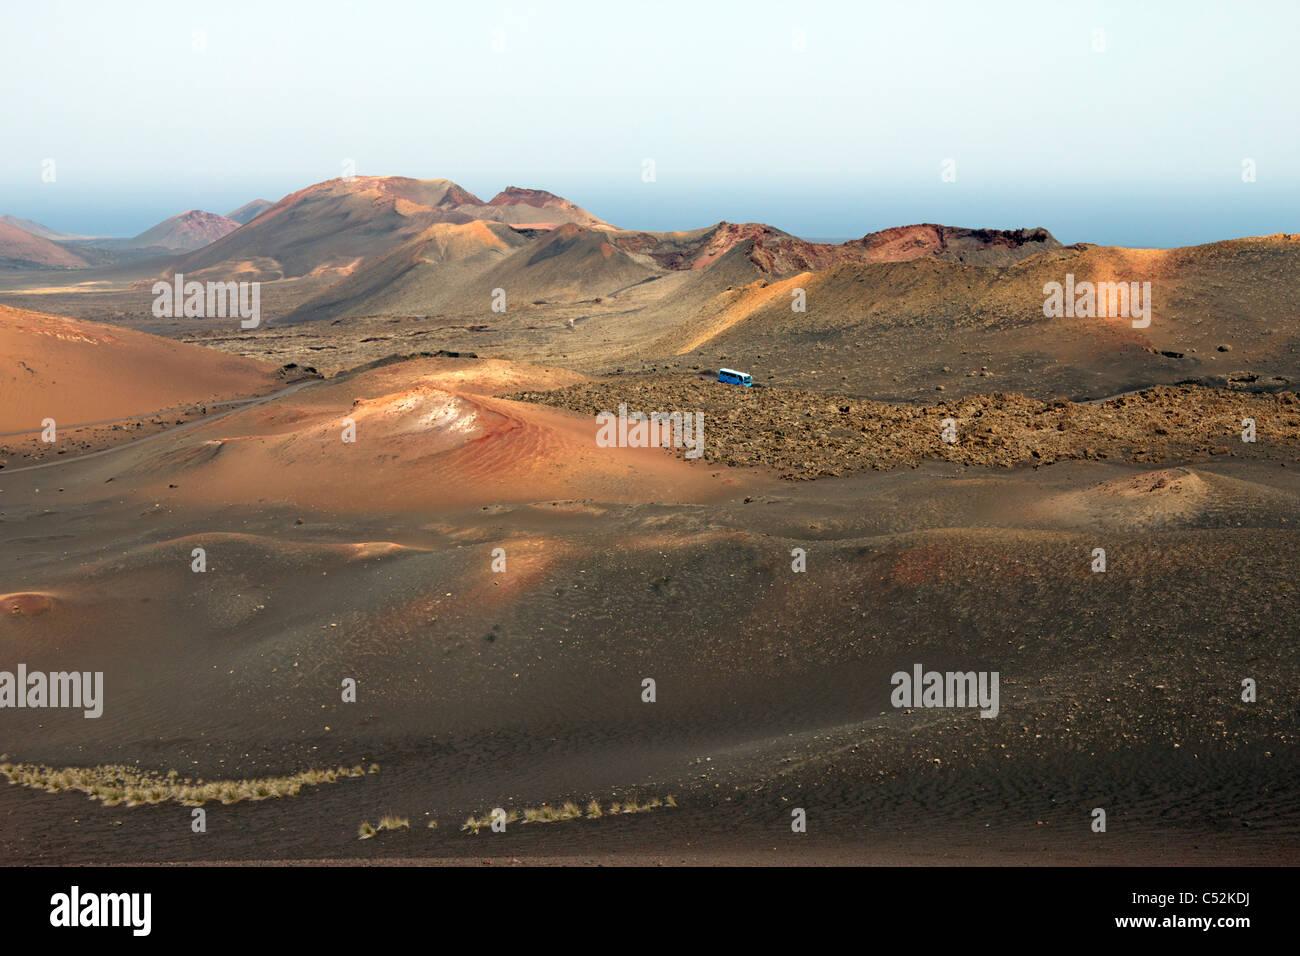 Nationalpark Timanfaya - Lanzarote - Kanarische Inseln Stockbild